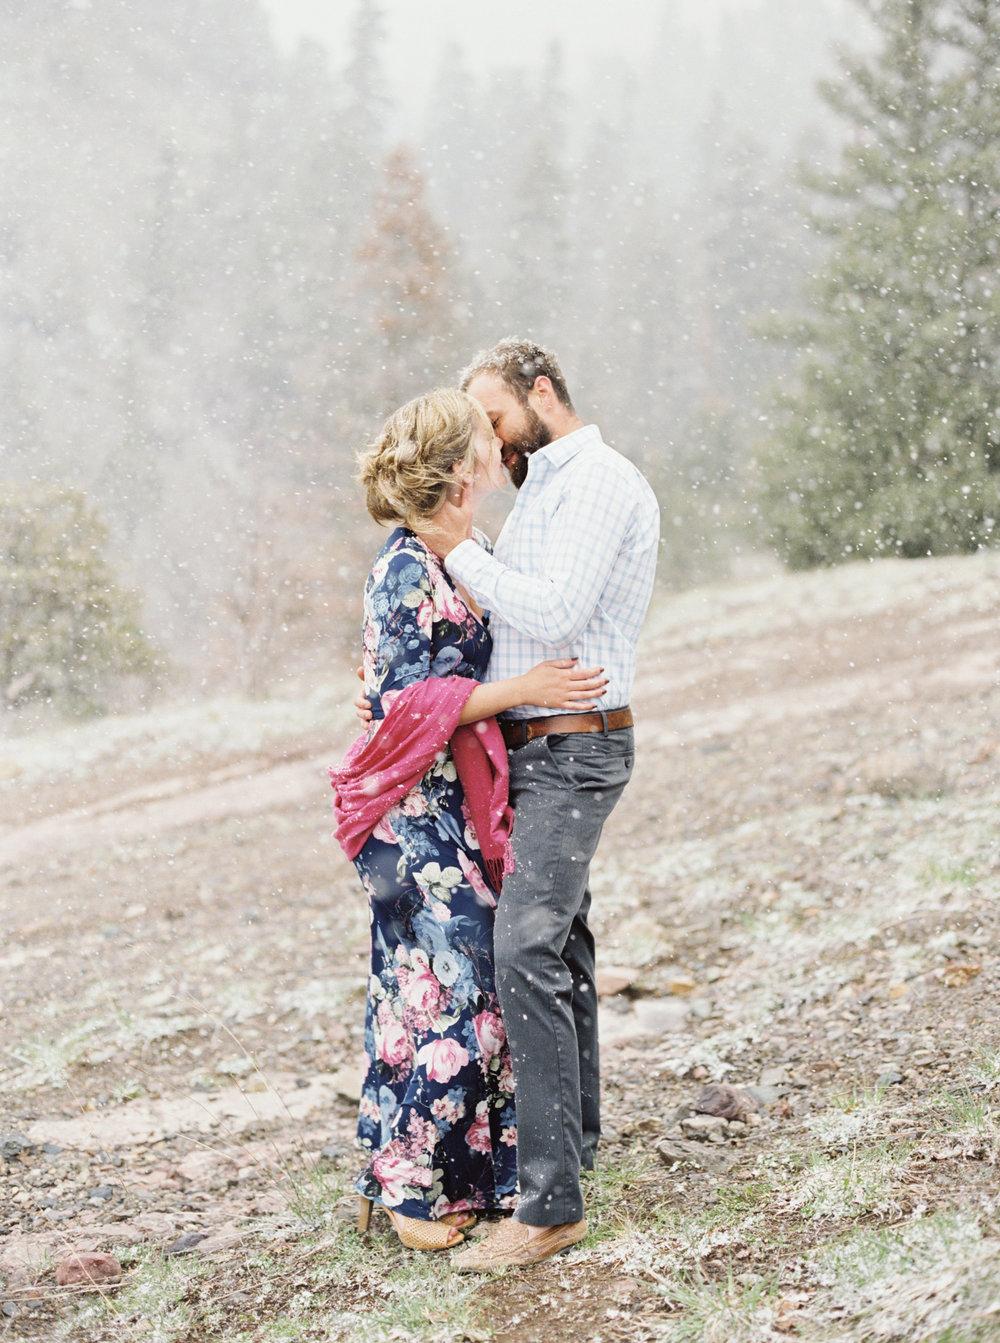 Snowy engagement photos in Colorado, by Dallas destination wedding photographer Tracy Enoch